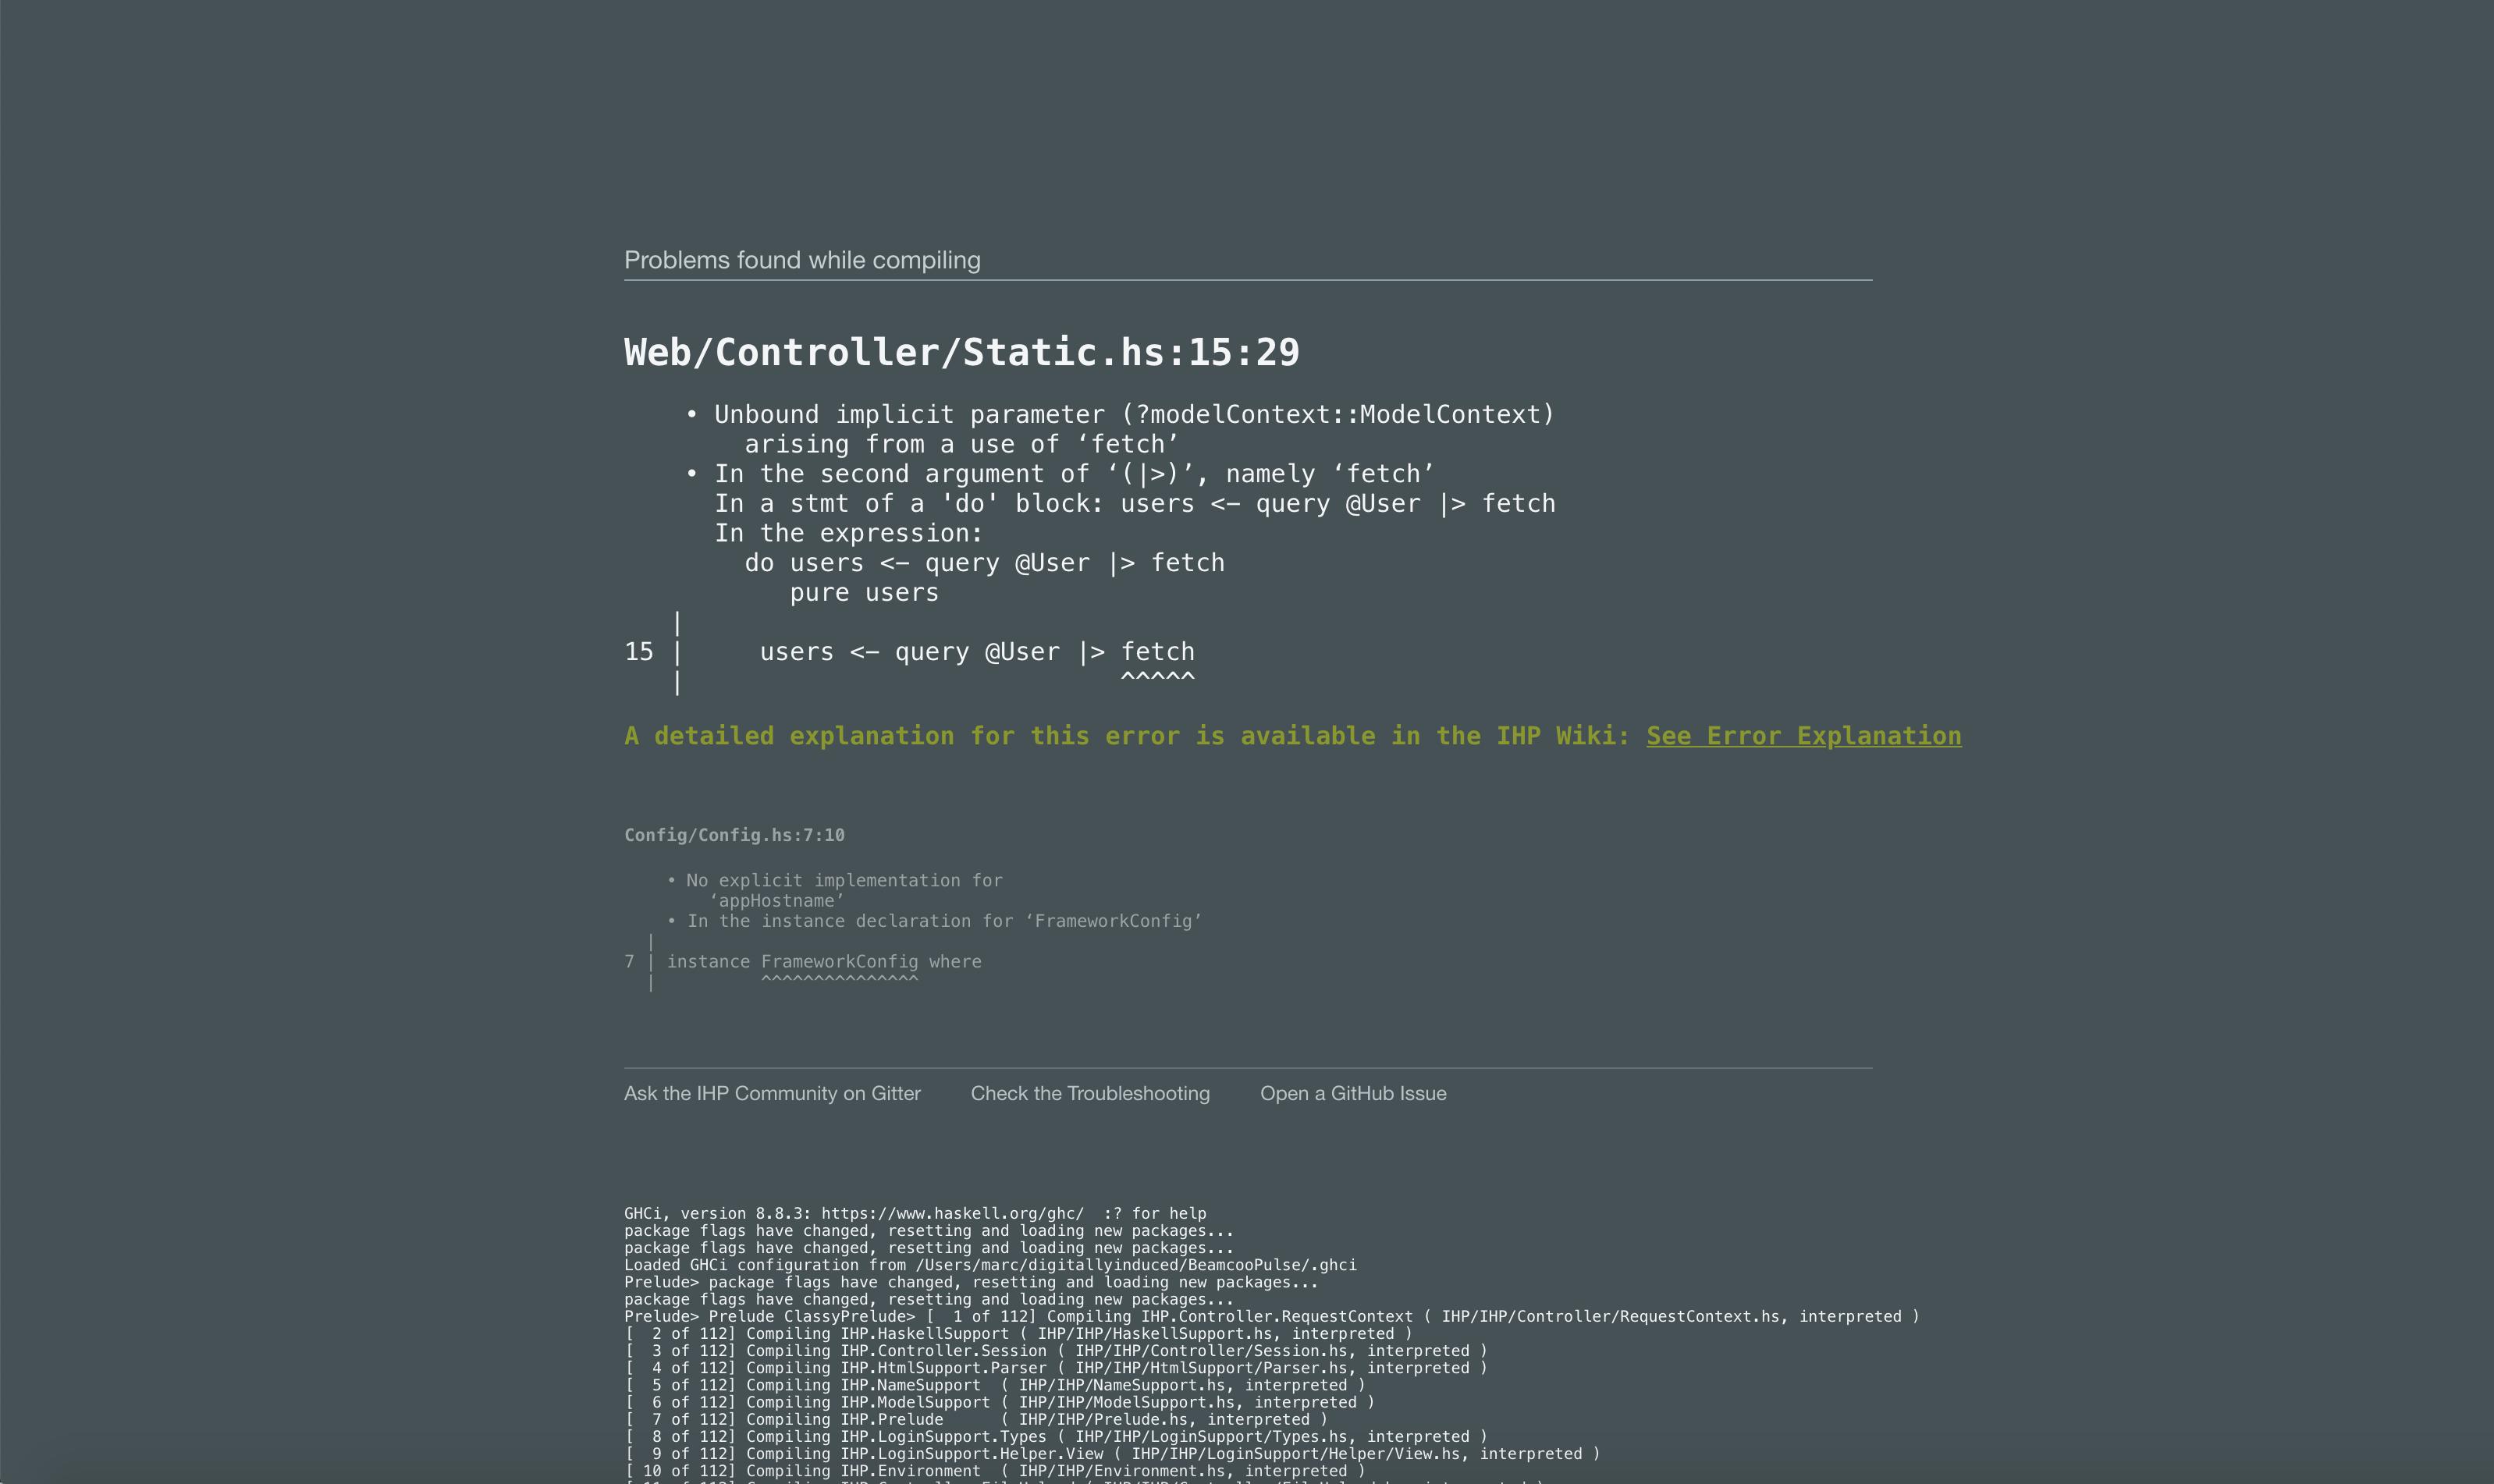 Example of a status server error message